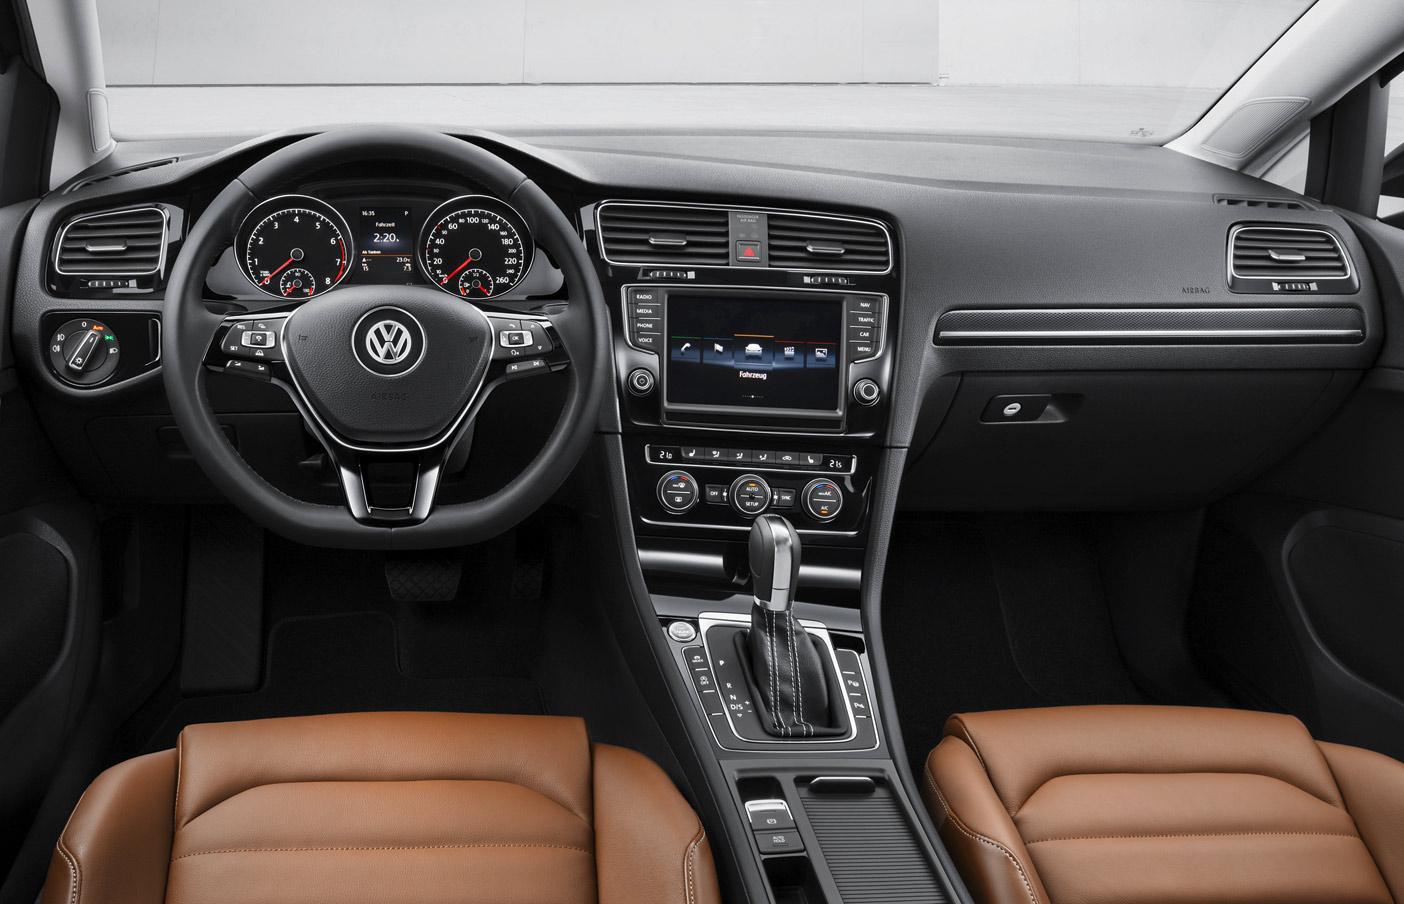 volkswagen-golf-7-interior-1 - VWVortex